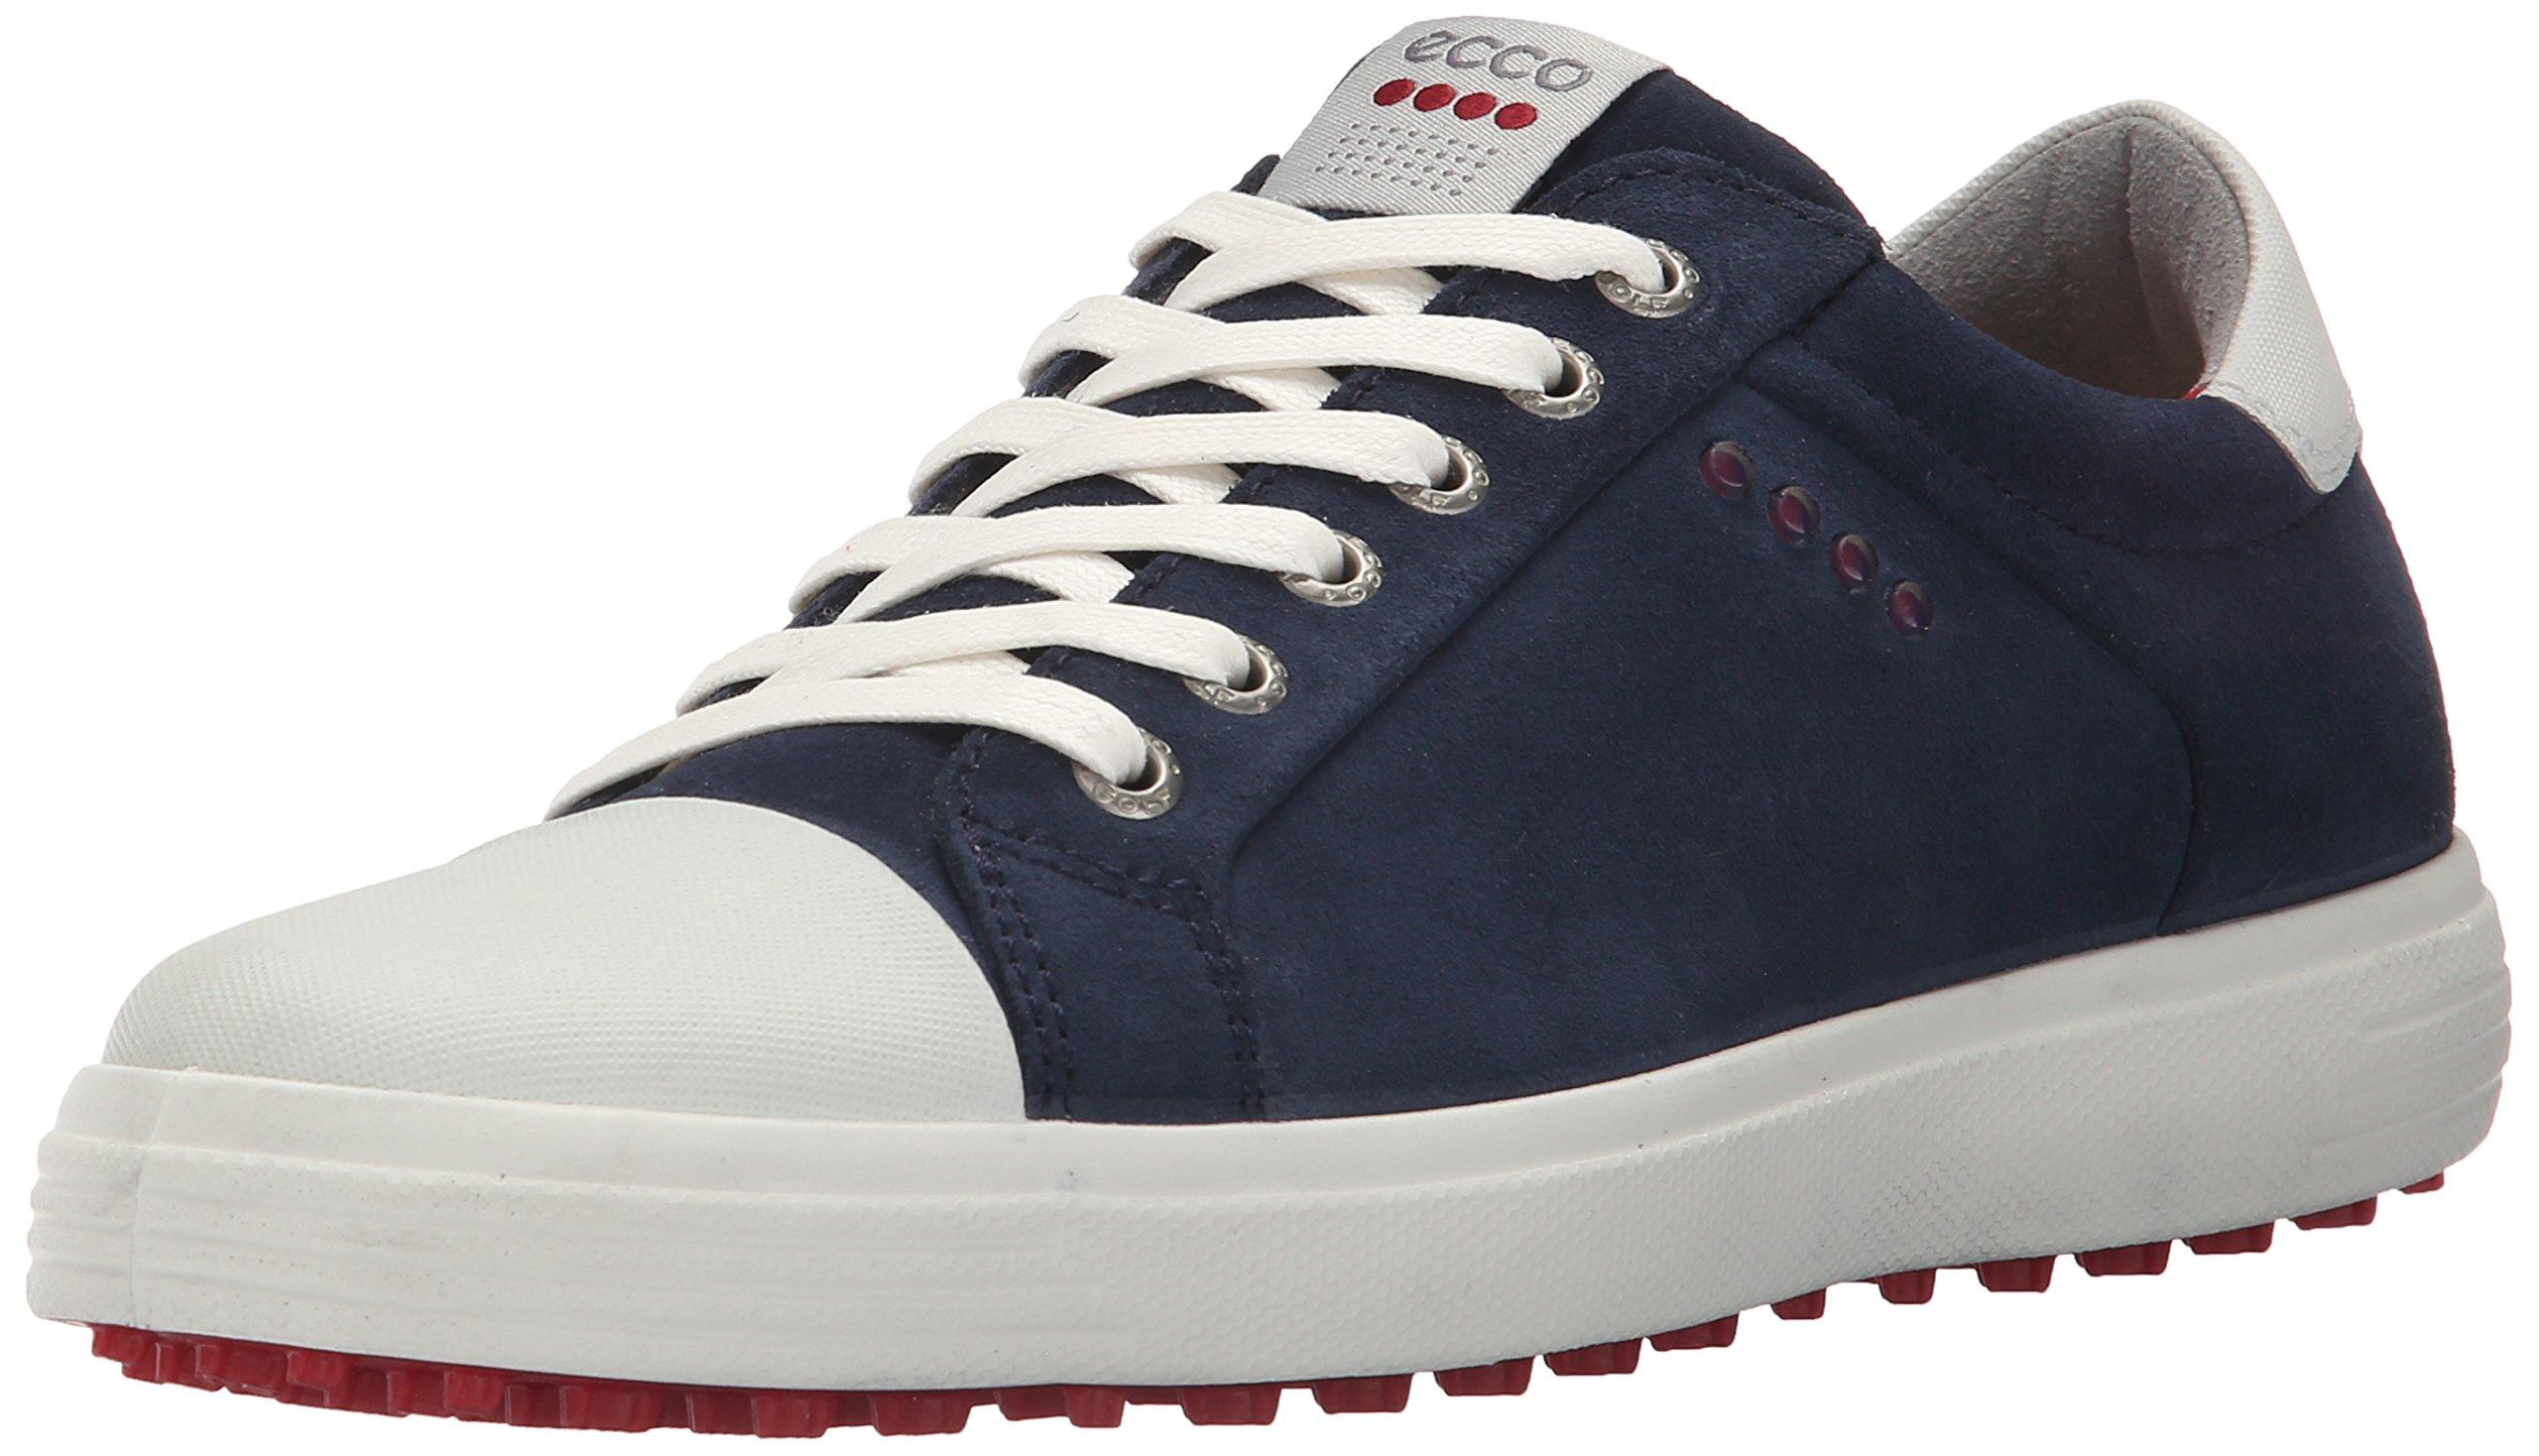 ECCO Men's Casual Hybrid Golf Shoe, Marine/White, 45 EU/11-11.5 M US